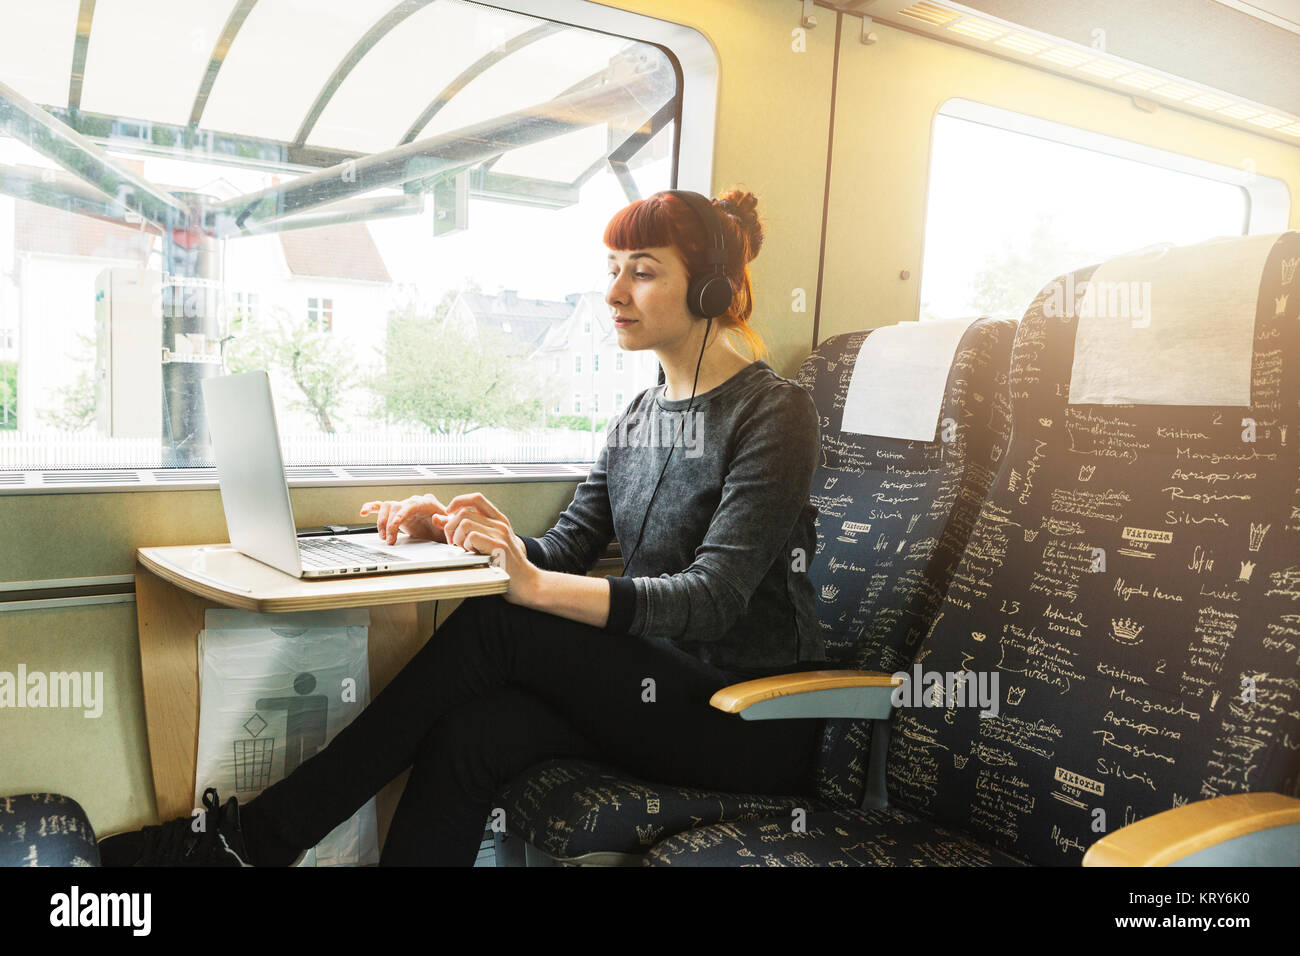 Woman using laptop on train - Stock Image